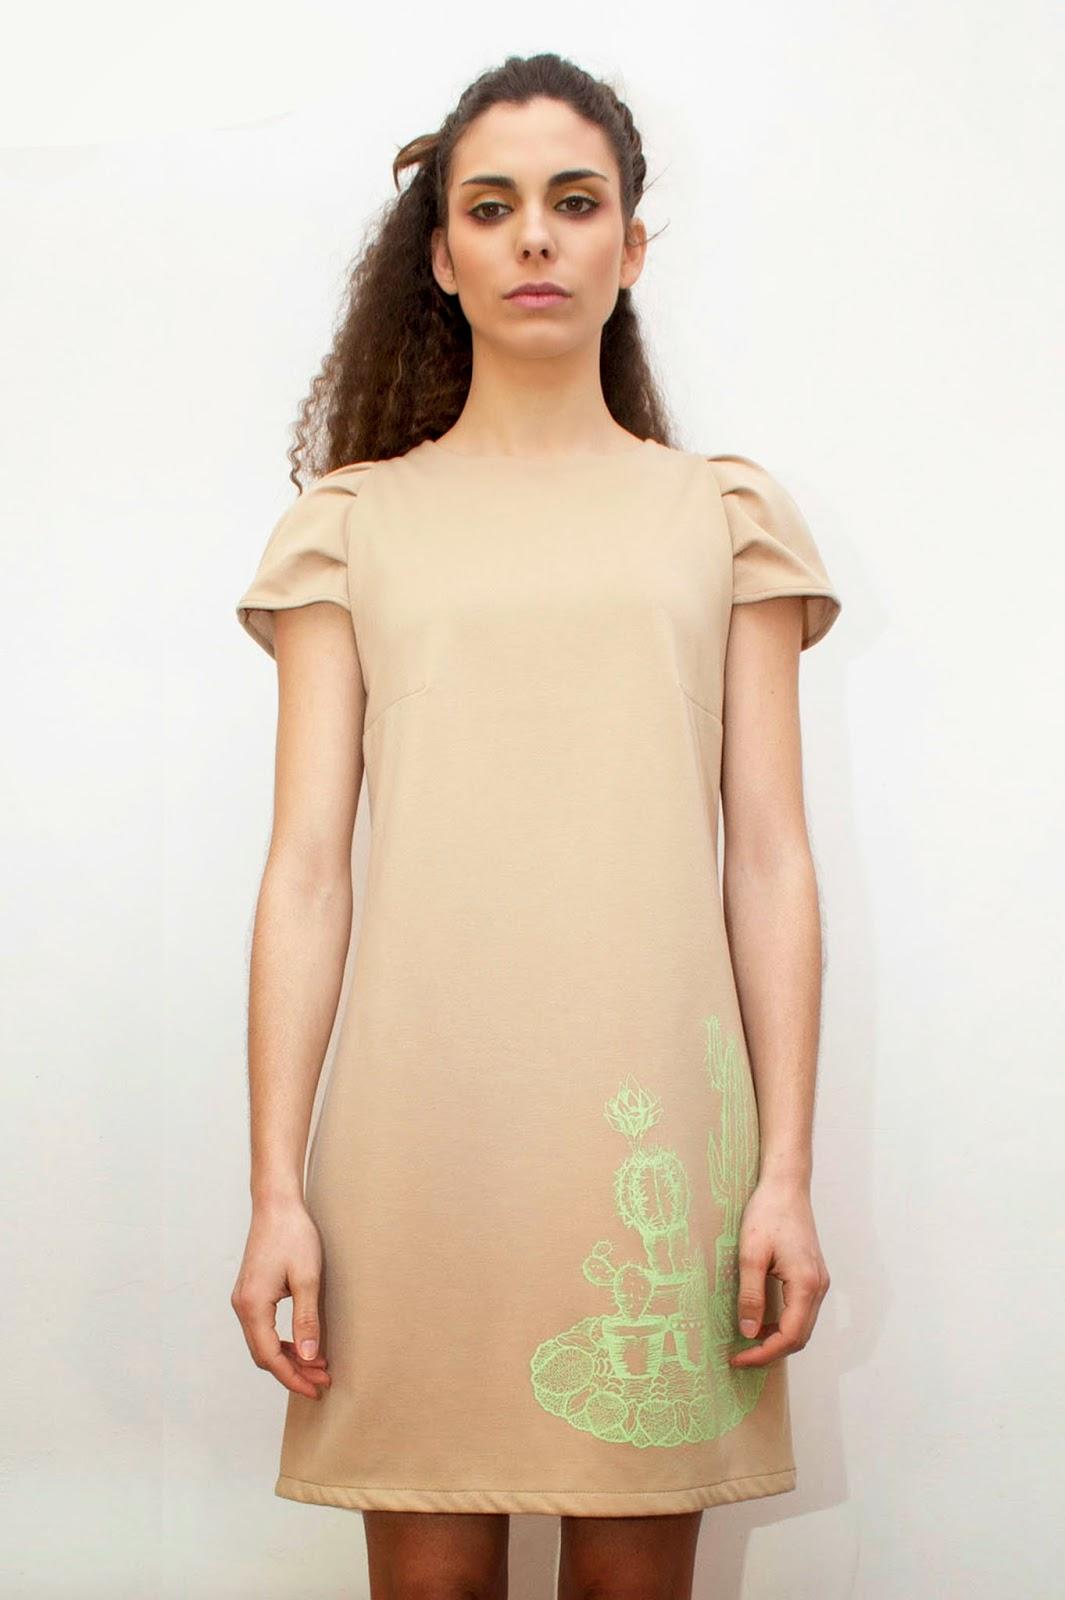 http://labocoqueshop.bigcartel.com/product/vestido-cactus-beige#.U2ow5aK1vA4